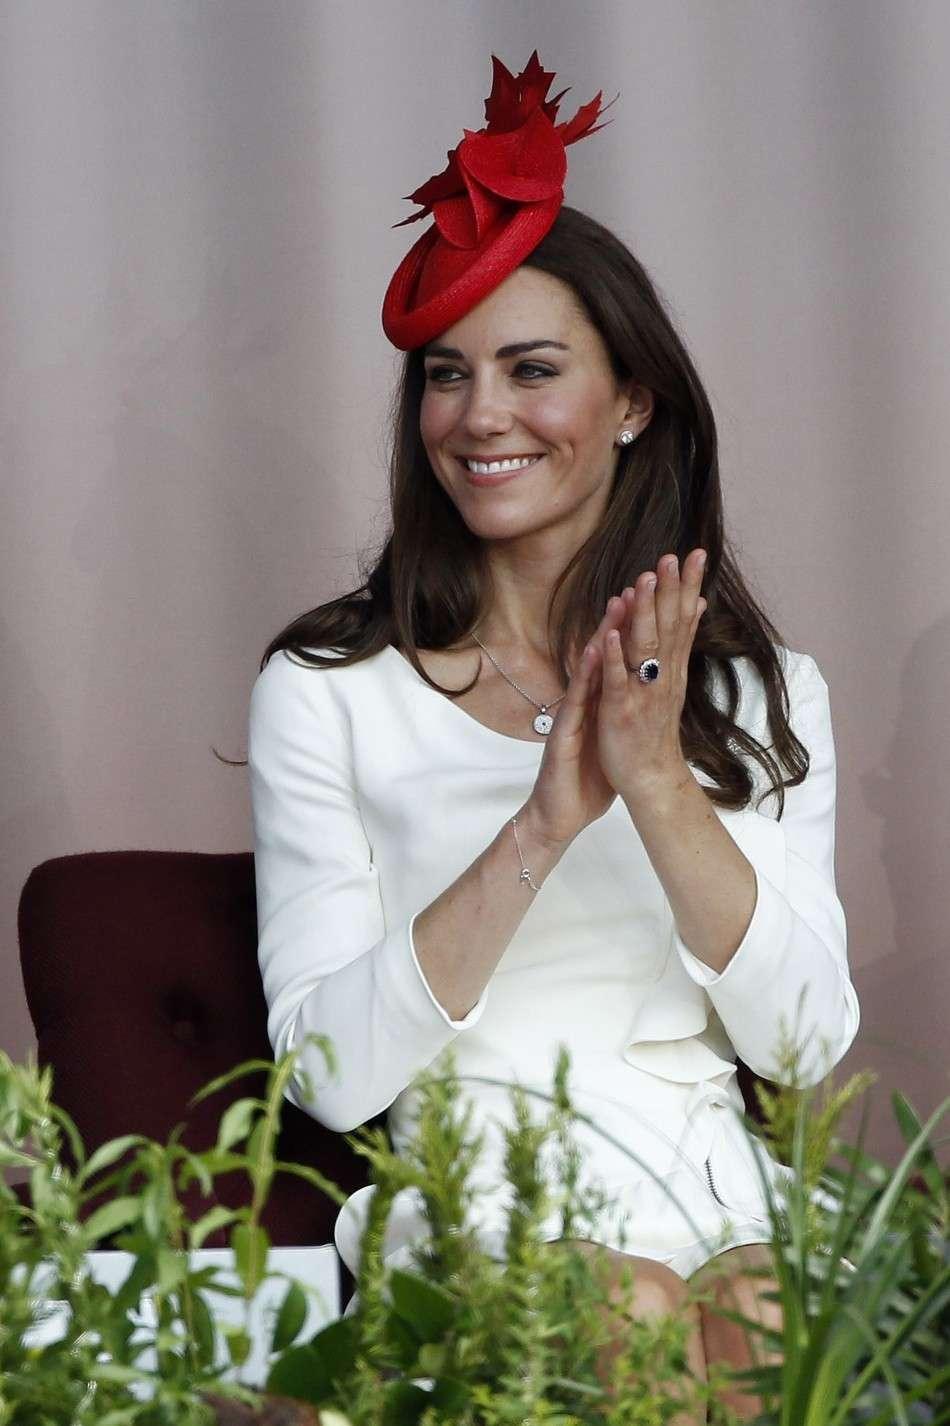 Kate Middleton con cappello rosso